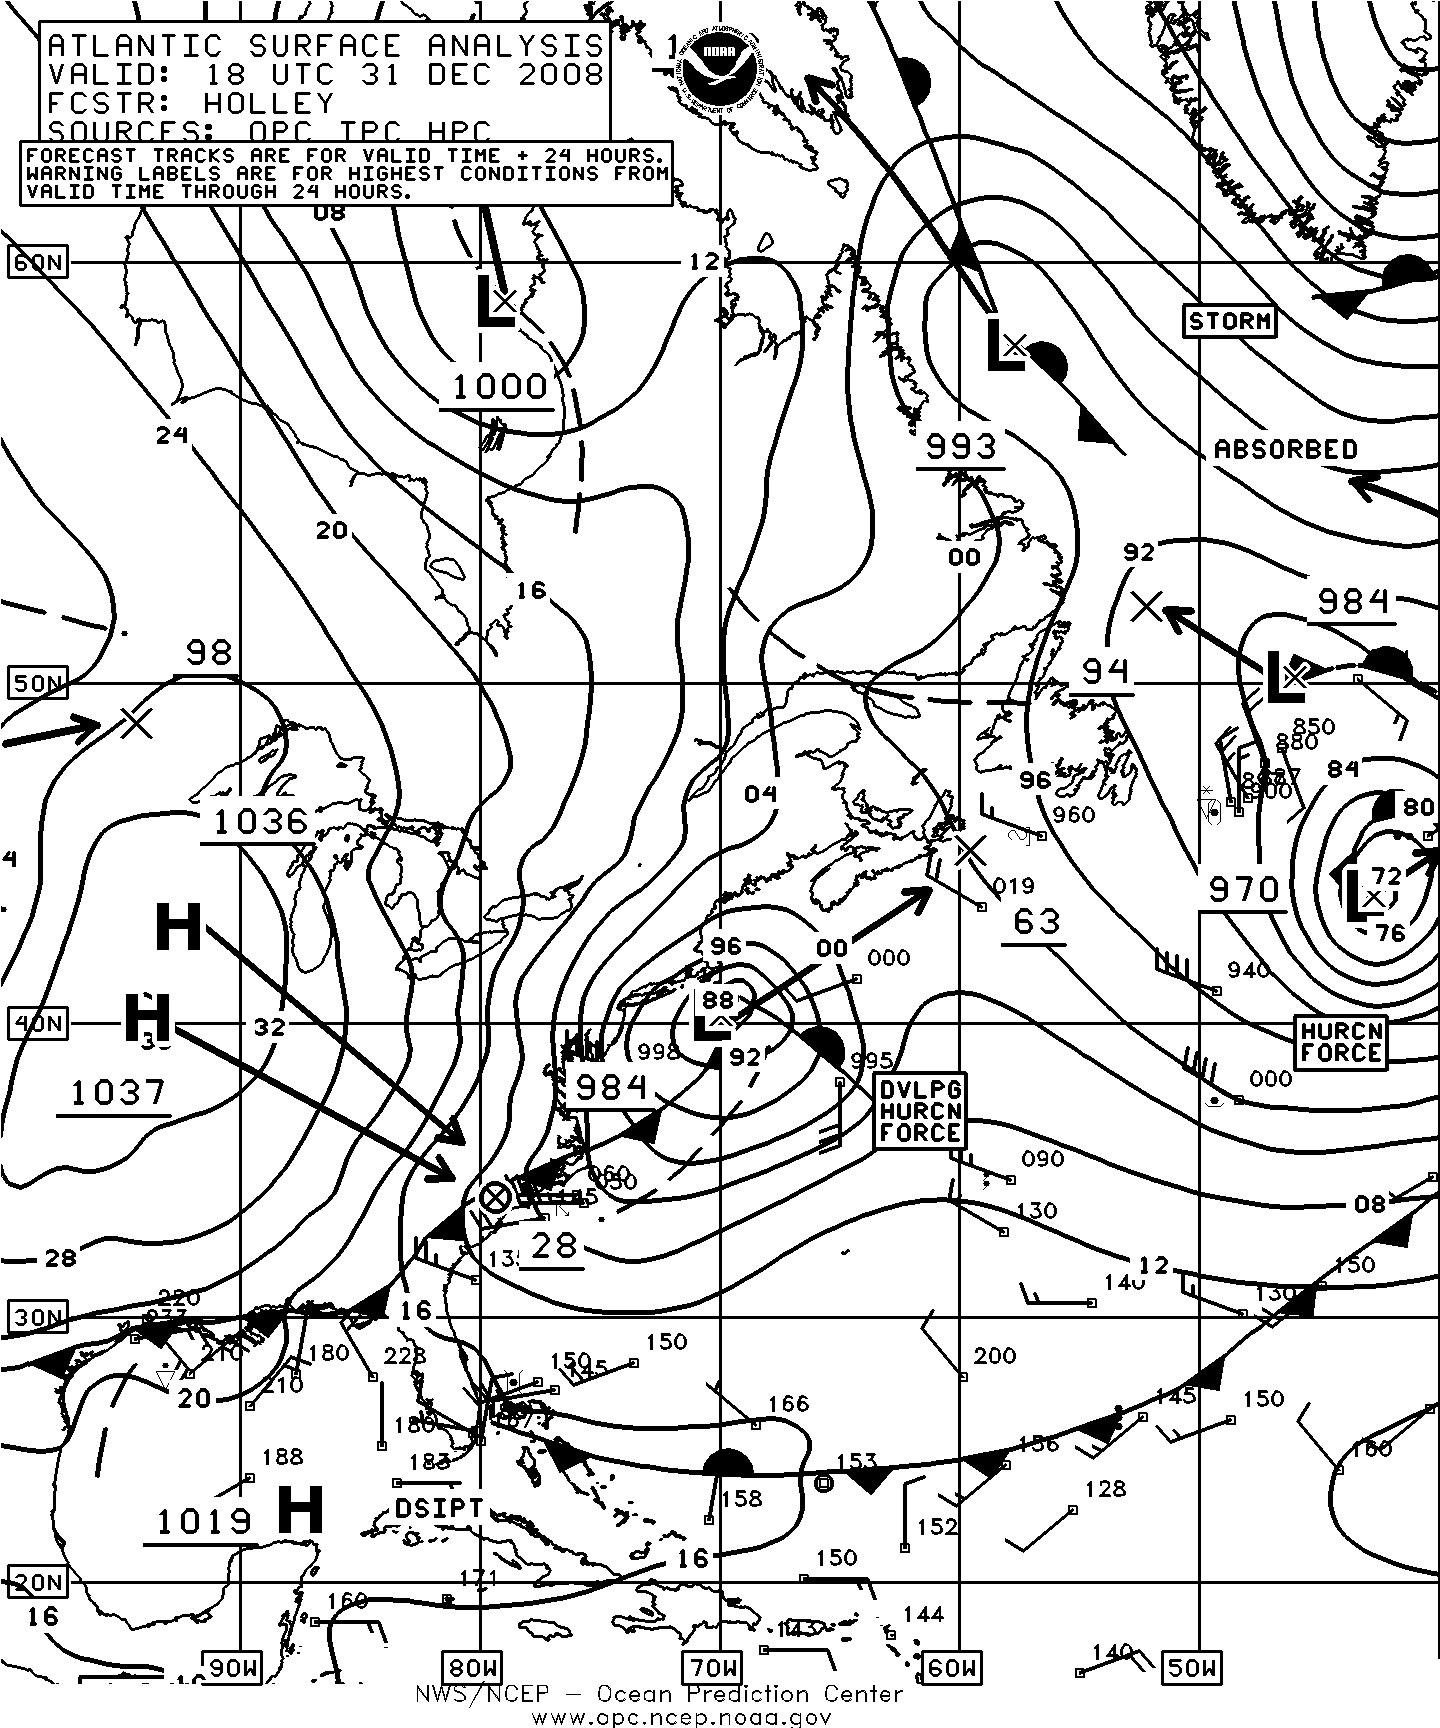 Mariners Weather Log Vol. 53, No. 1, April 2009